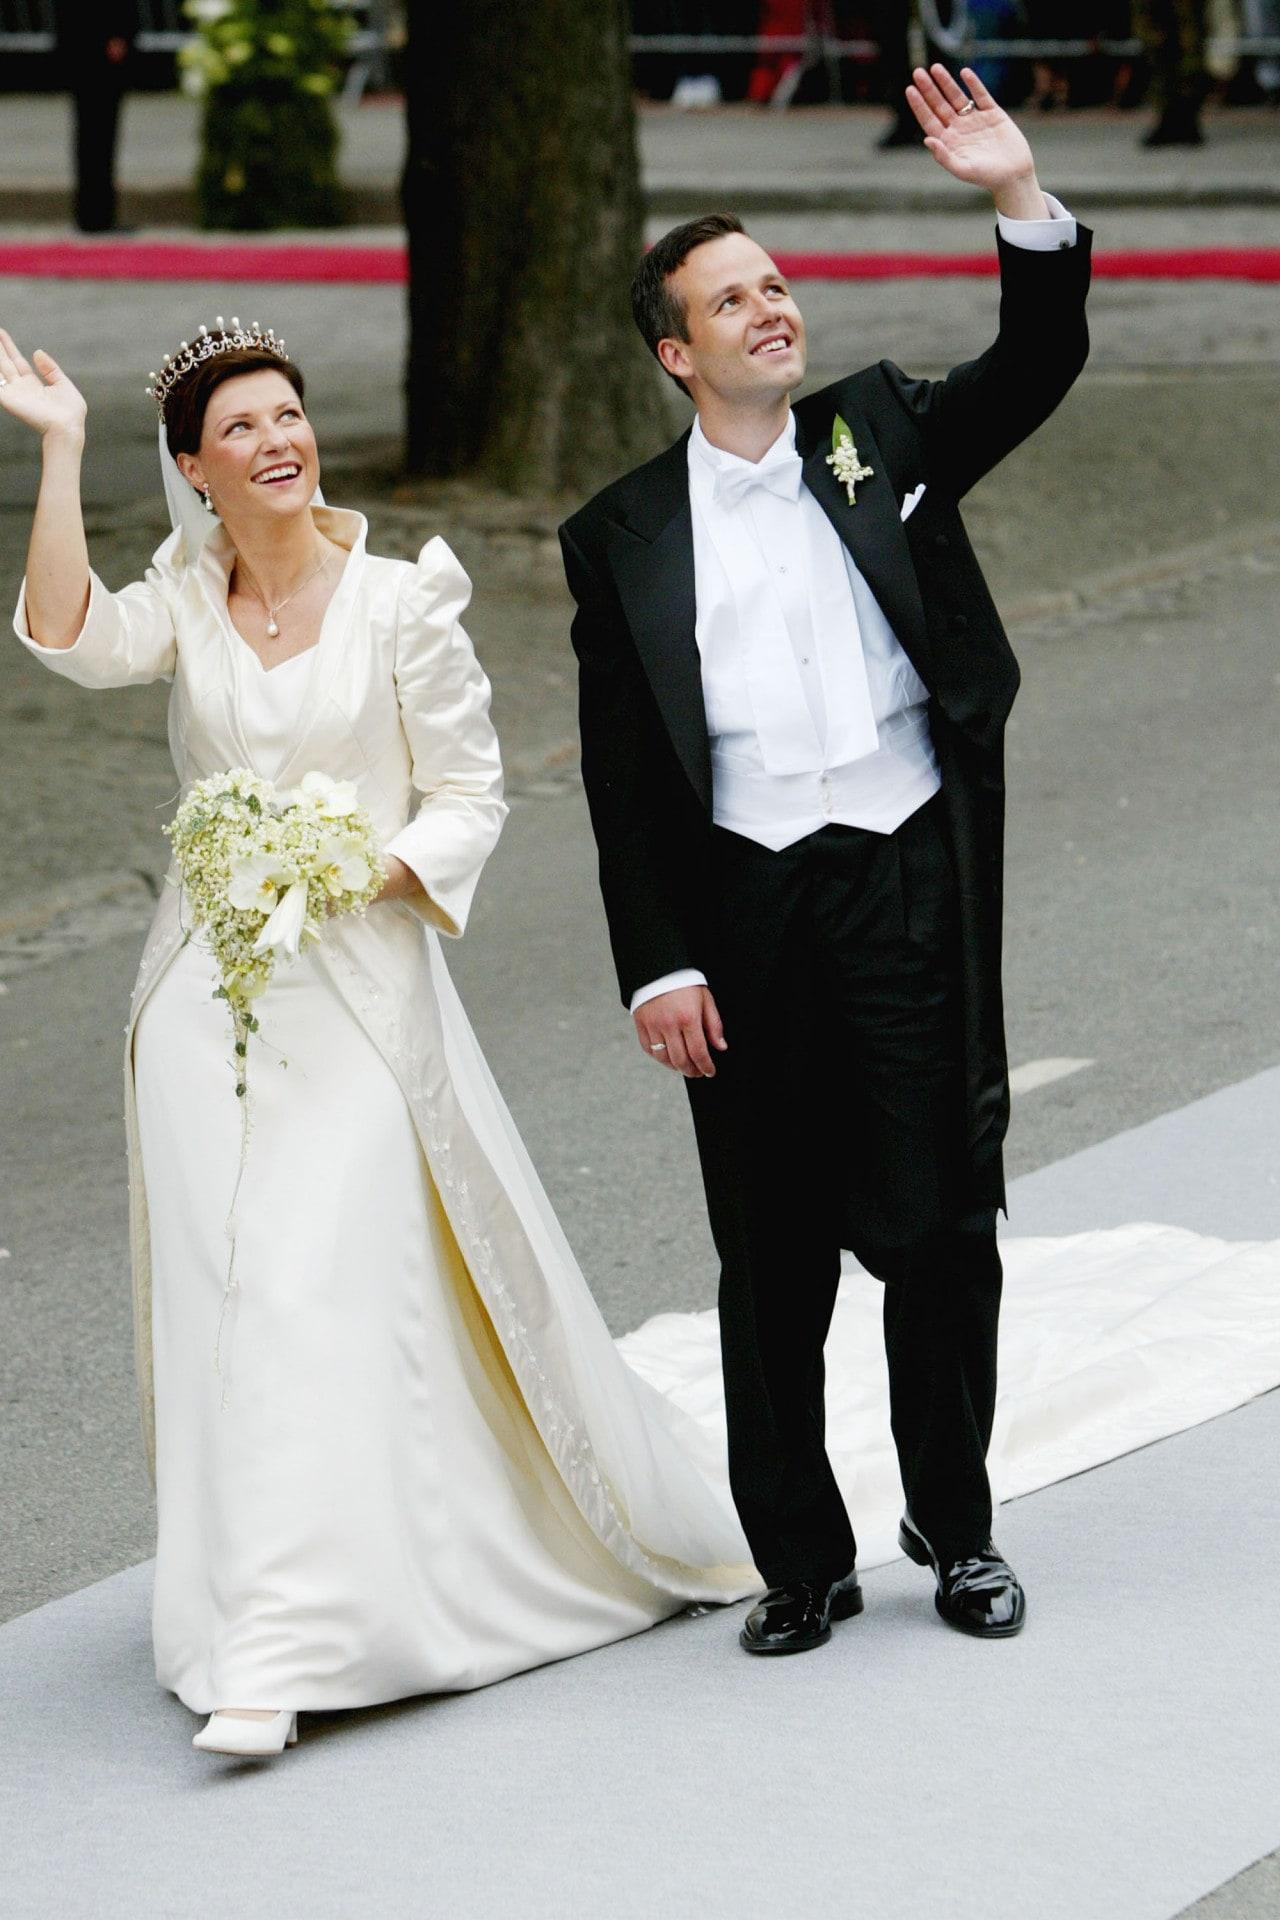 Inside Princess Märtha Louise and Ari Behn's 2002 wedding